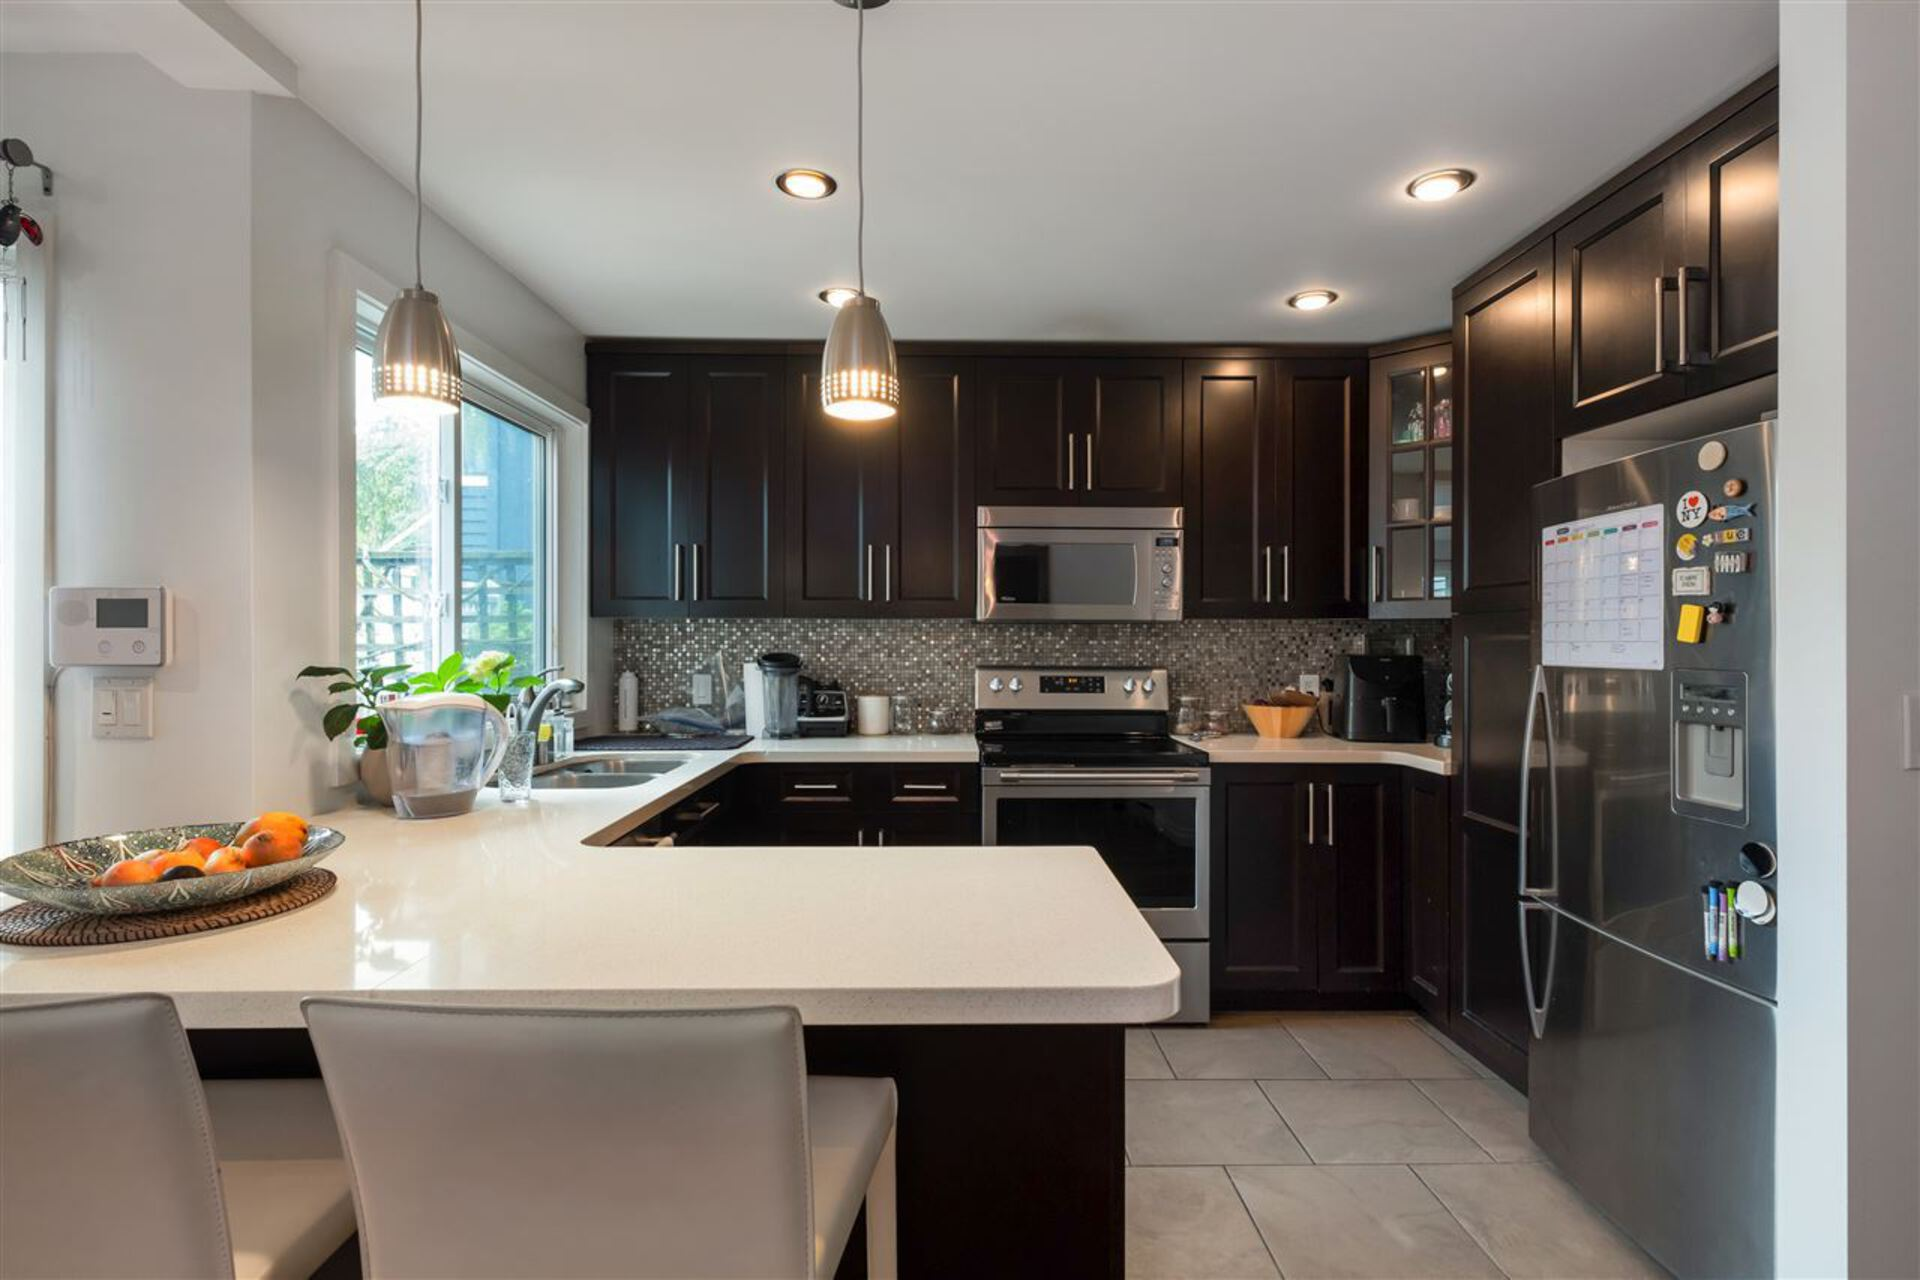 2536-cornwall-avenue-kitsilano-vancouver-west-10 at 2536 Cornwall Avenue, Kitsilano, Vancouver West